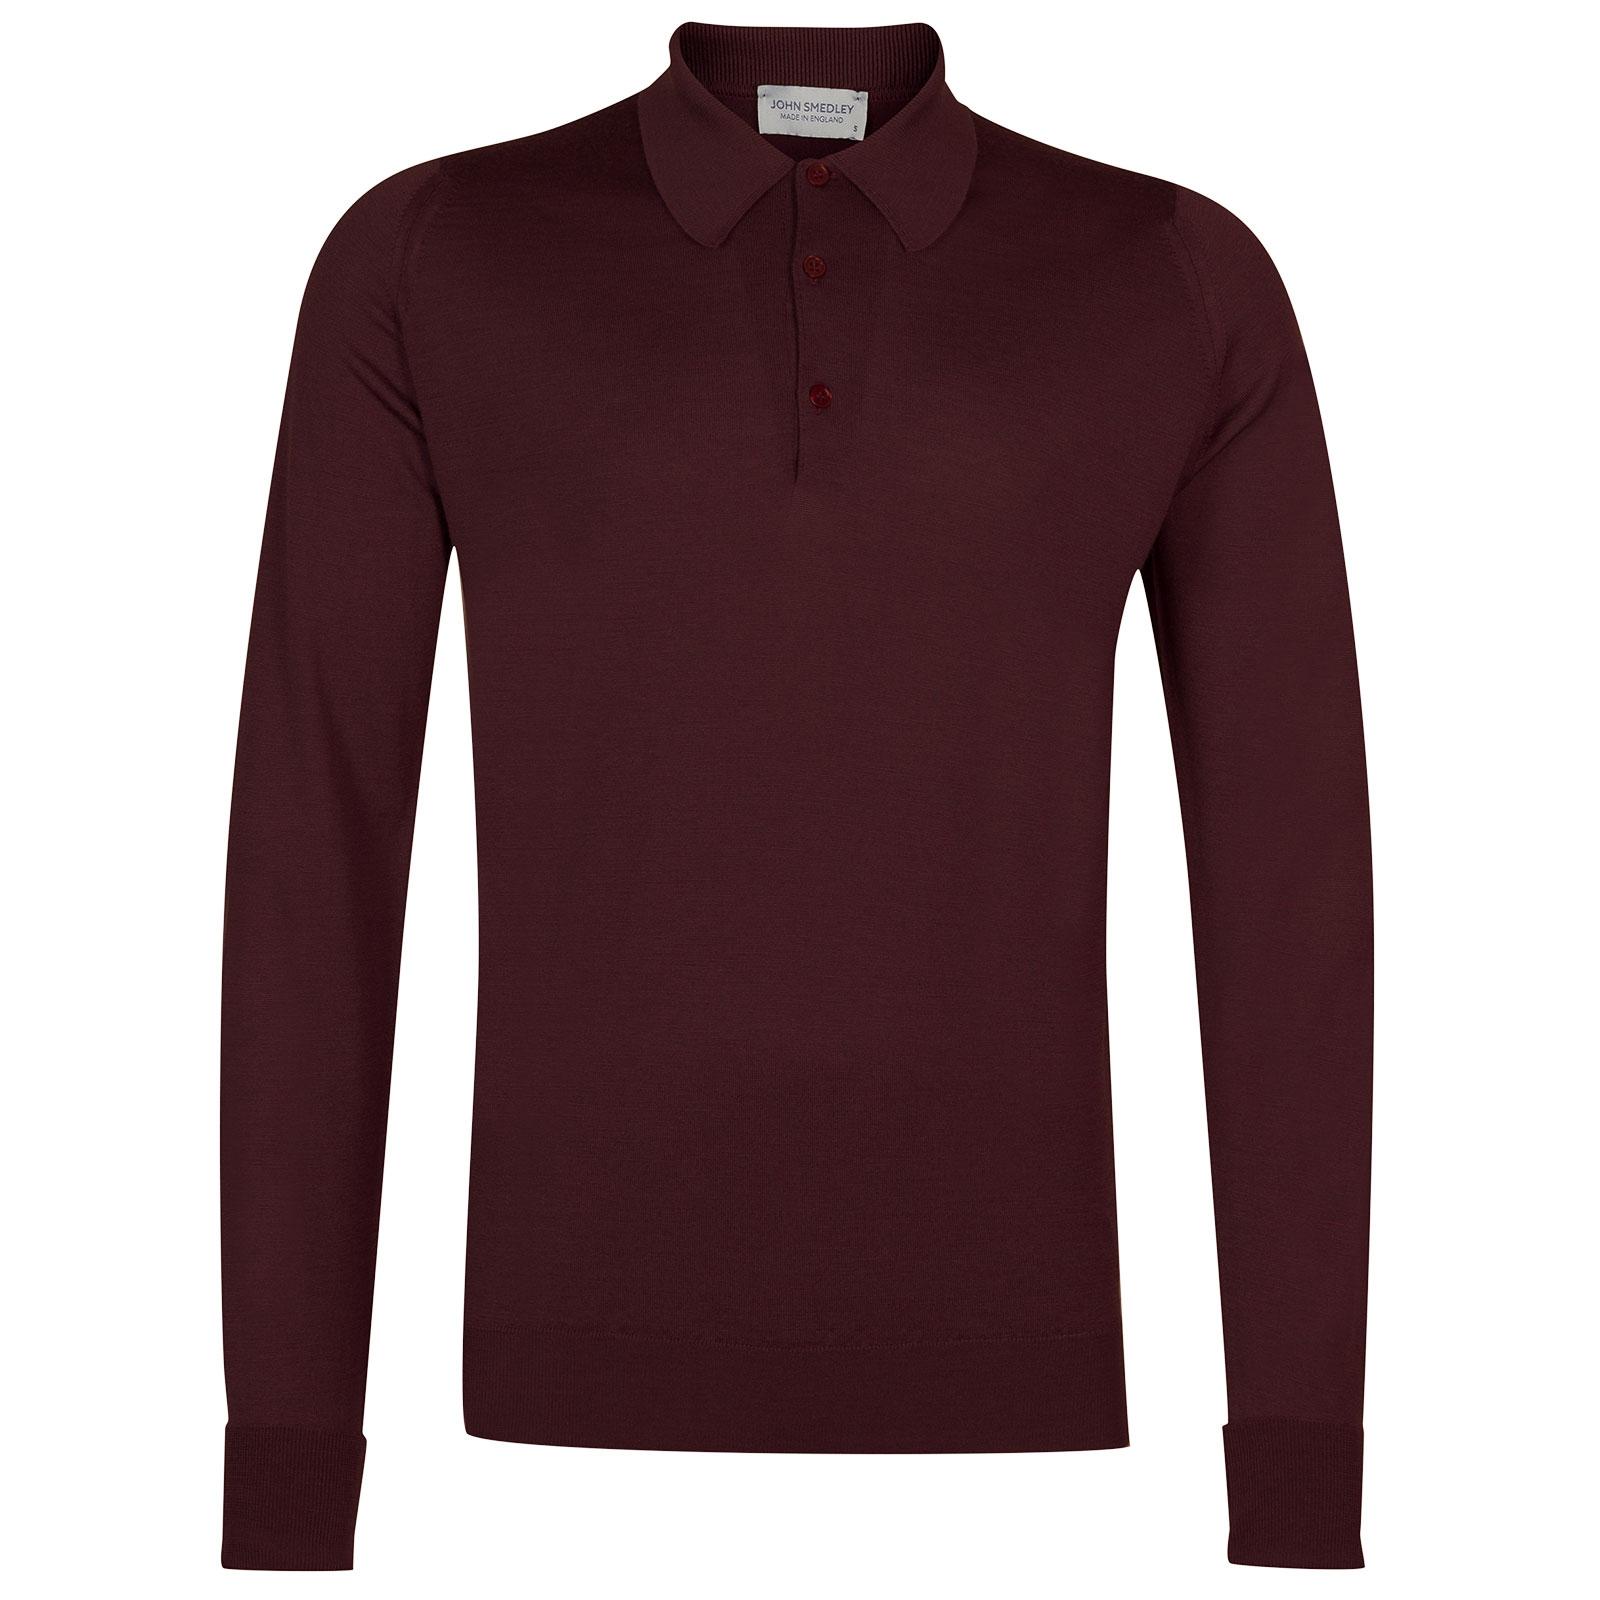 John Smedley dorset Merino Wool Shirt in Maroon Blaze-XS